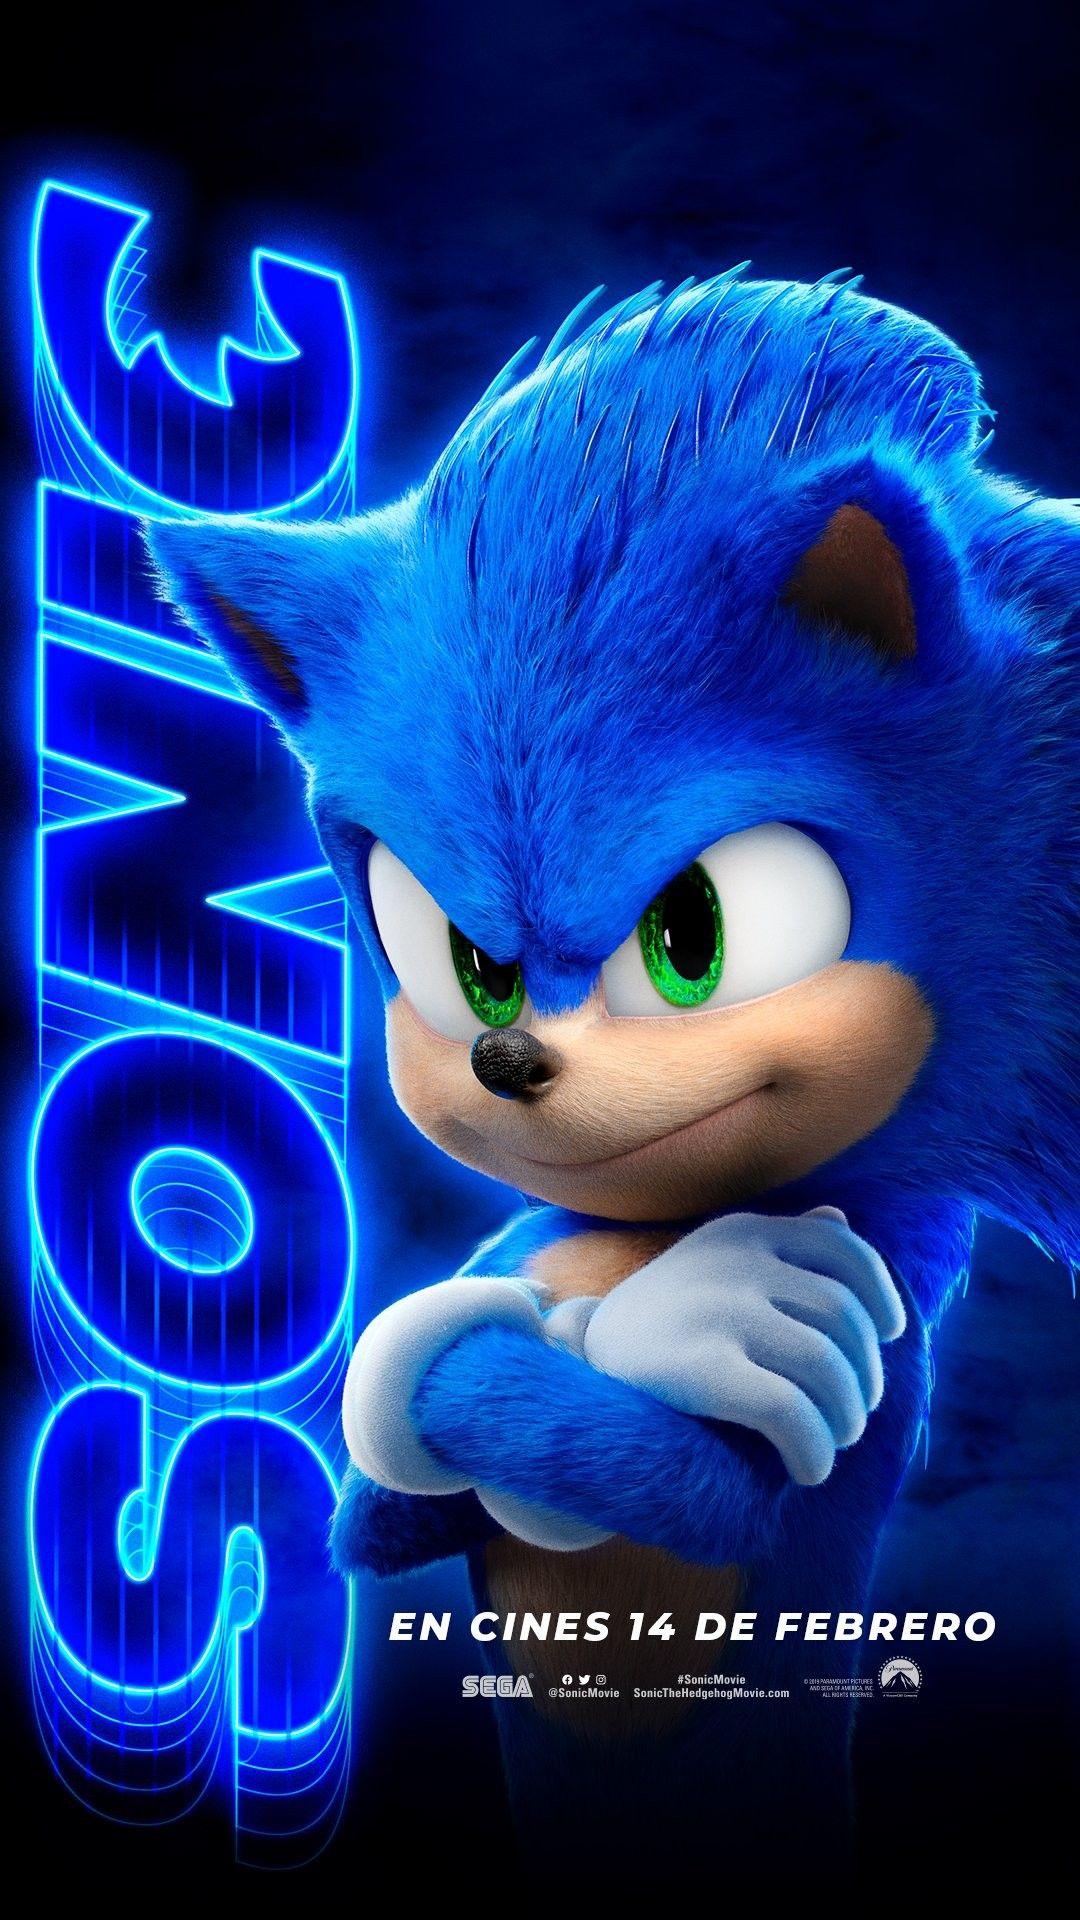 """Tenho que. Ir. Rápido!"", CatchSonic SonicMovie 13 de"